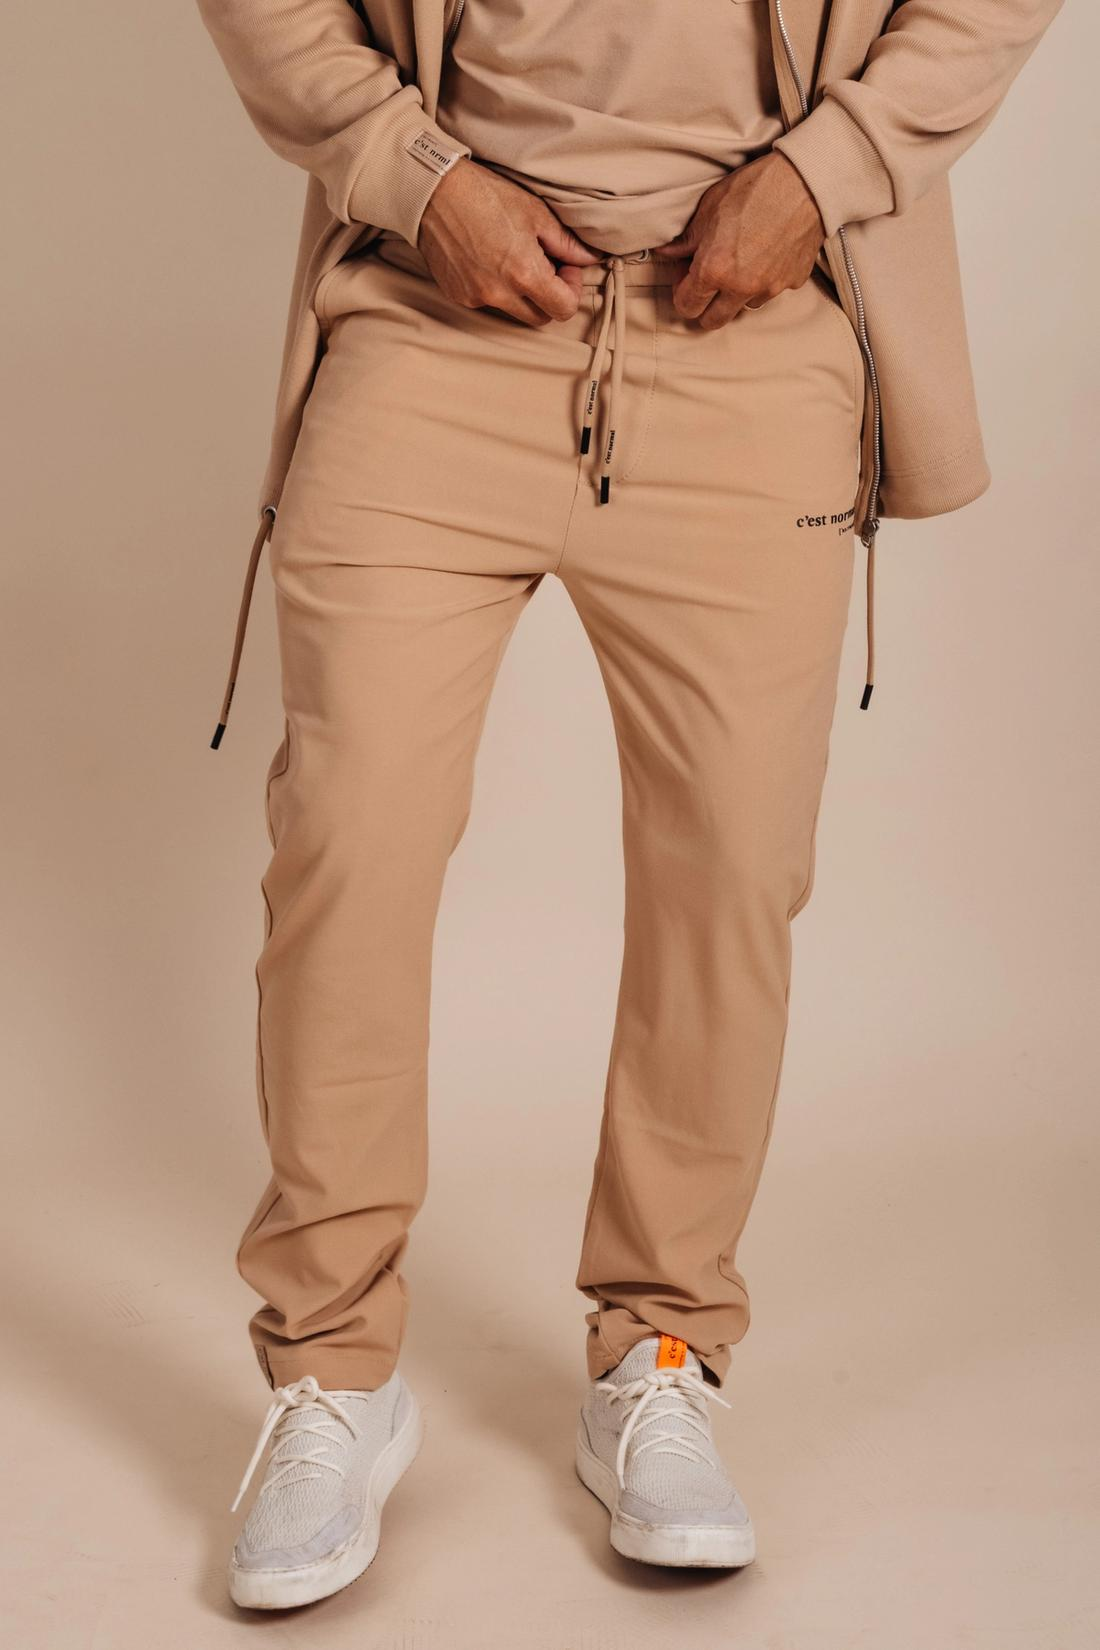 Proper Looking Pants